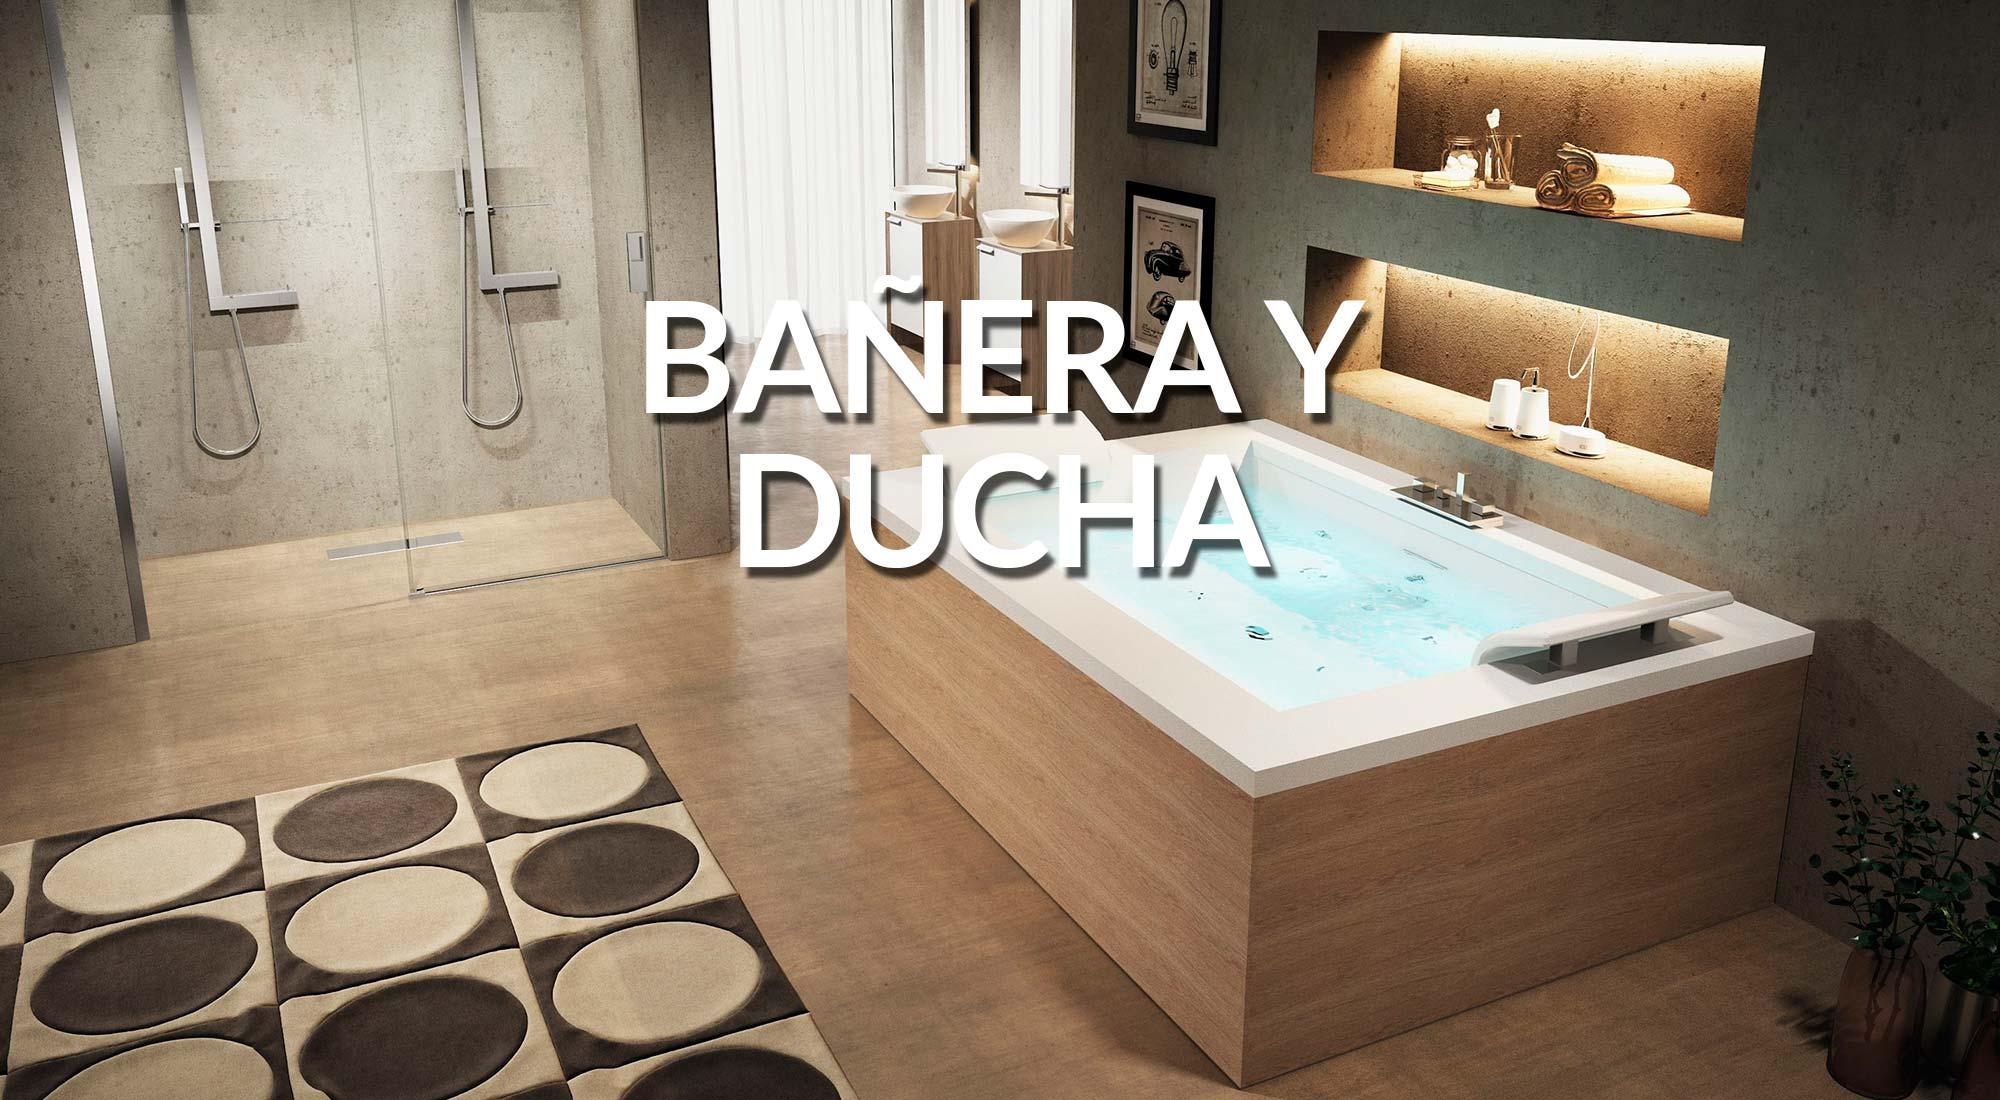 Bañera y ducha 4